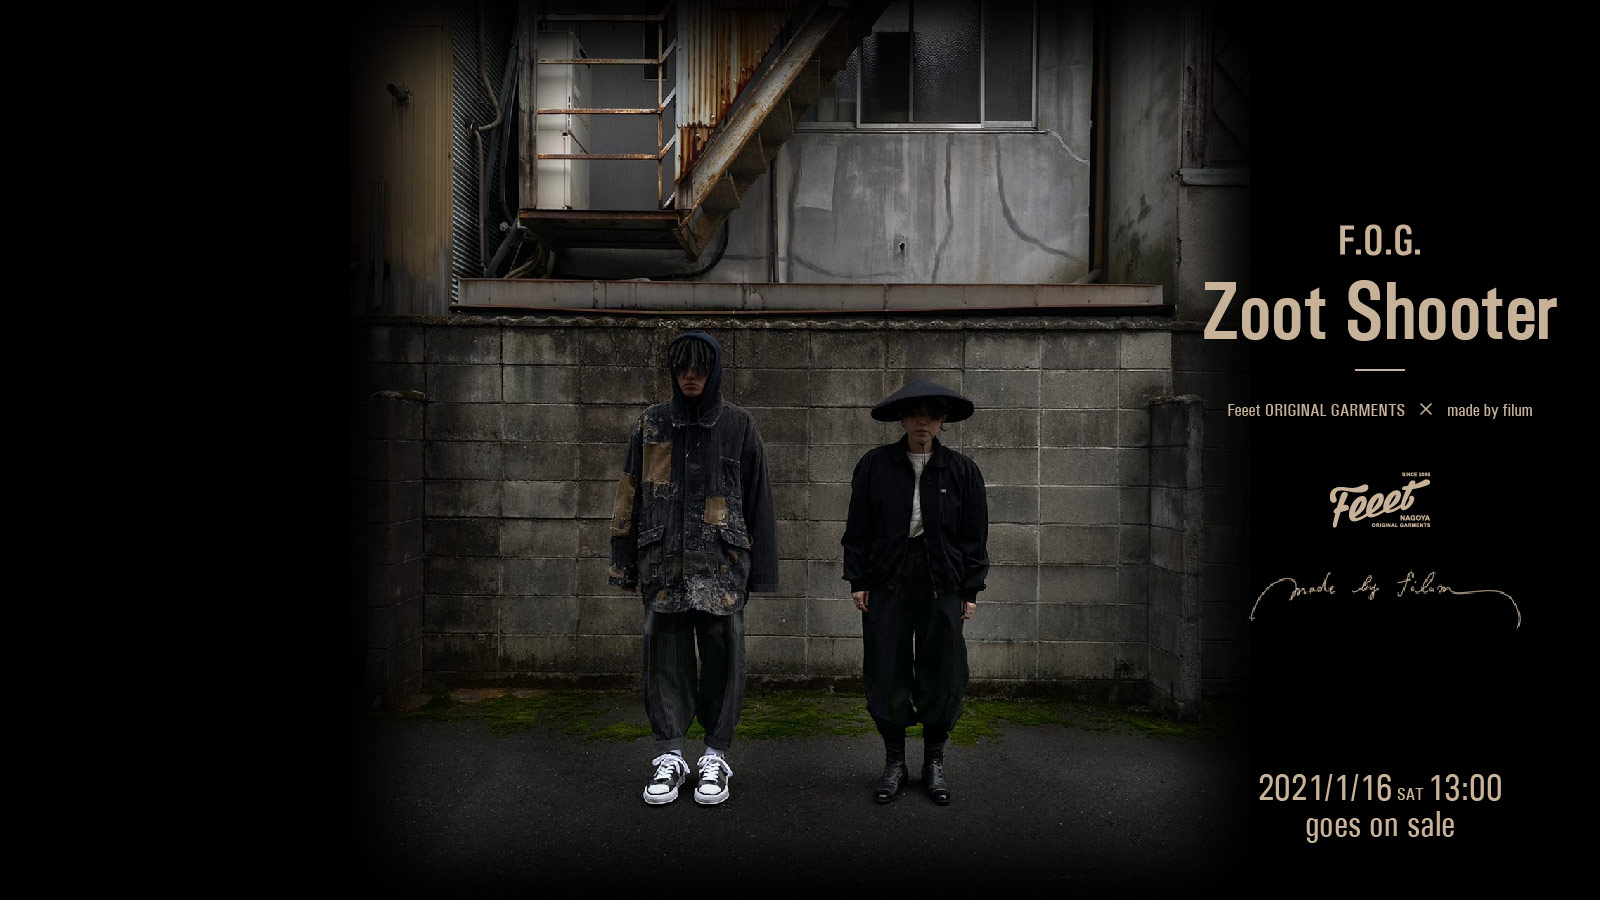 F.O.G. Zoot Shooter2021